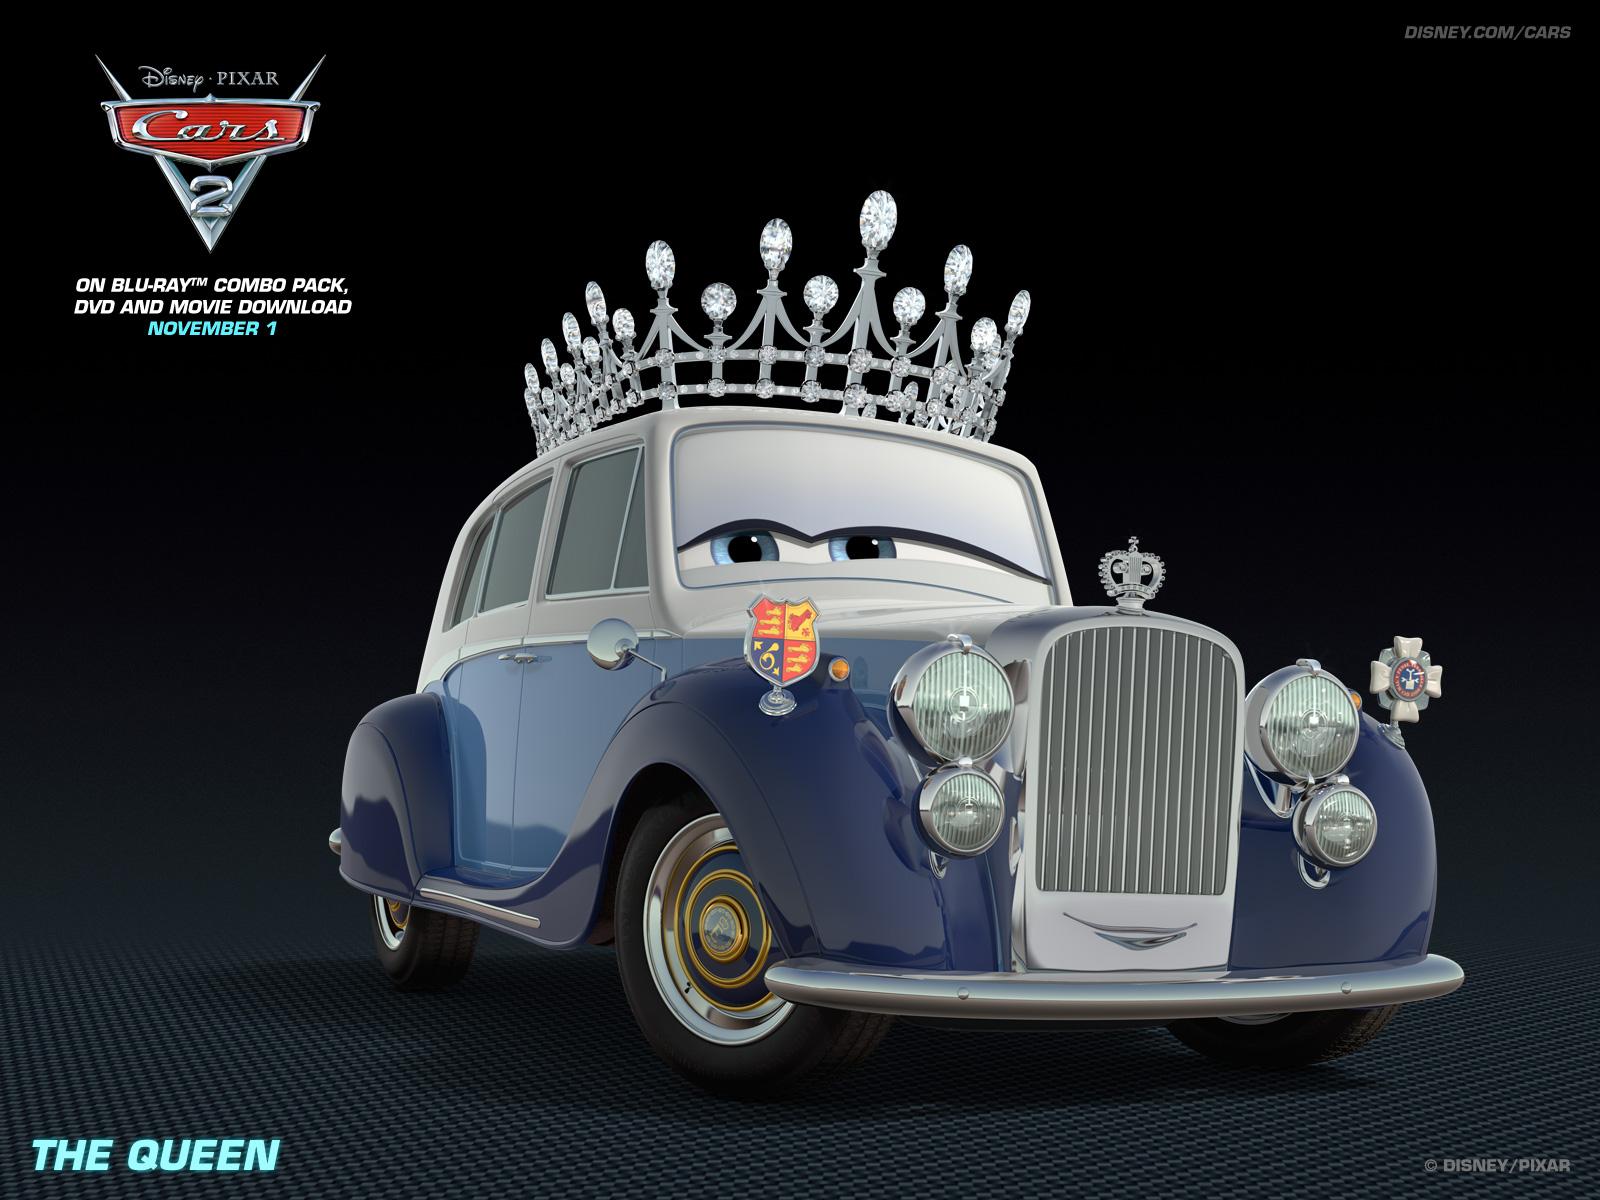 Queen   Disney Pixar Cars 2 Wallpaper 28399864 1600x1200